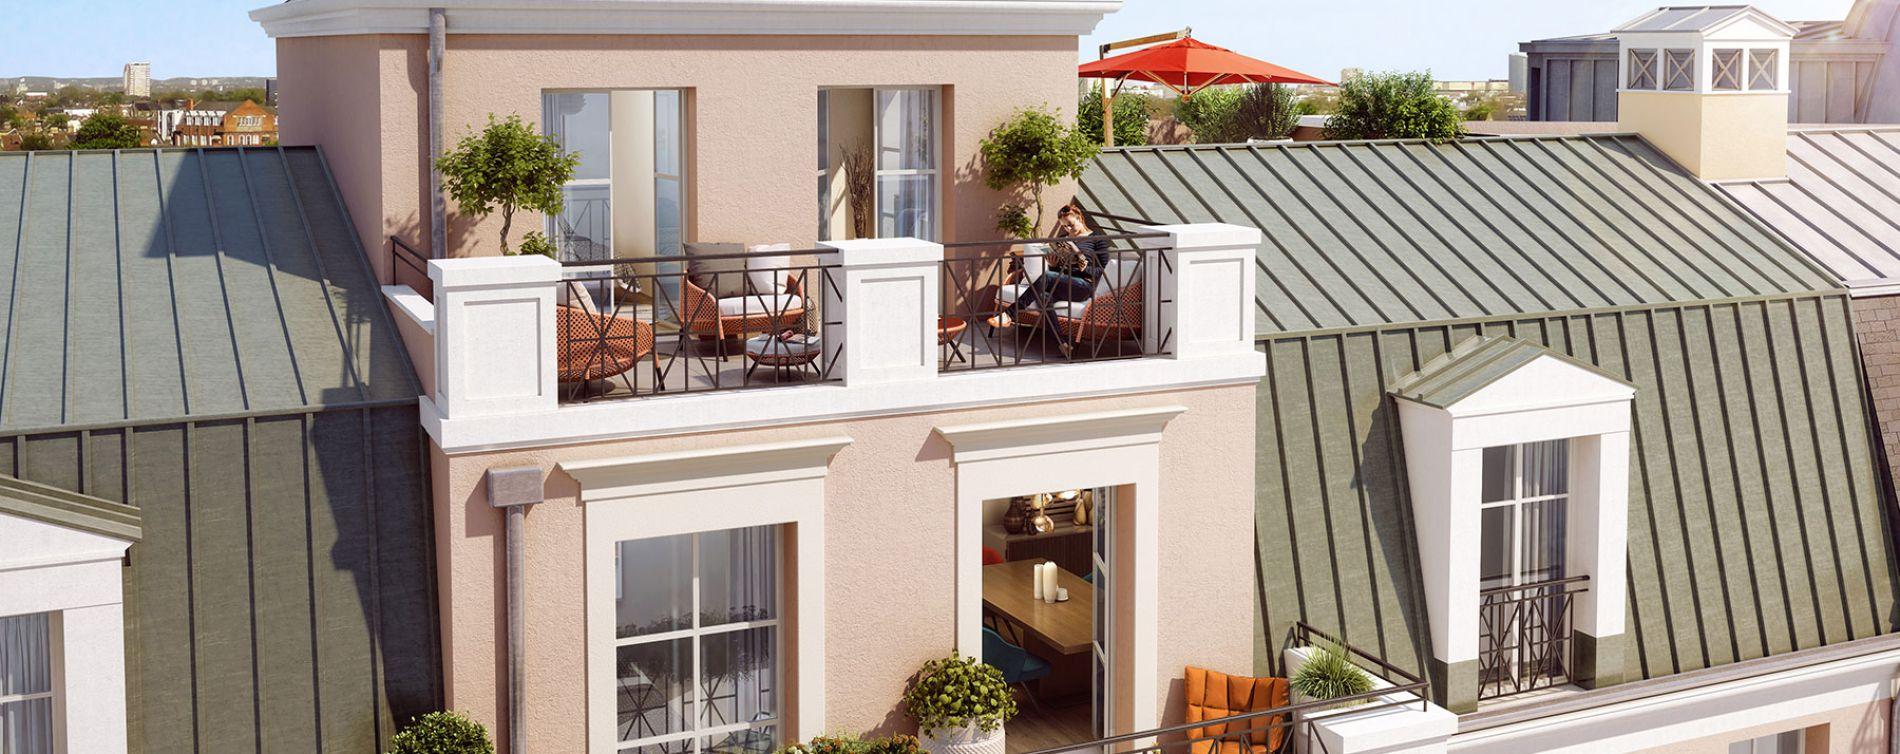 Le Blanc-Mesnil : programme immobilier neuve « Speedbird » (3)